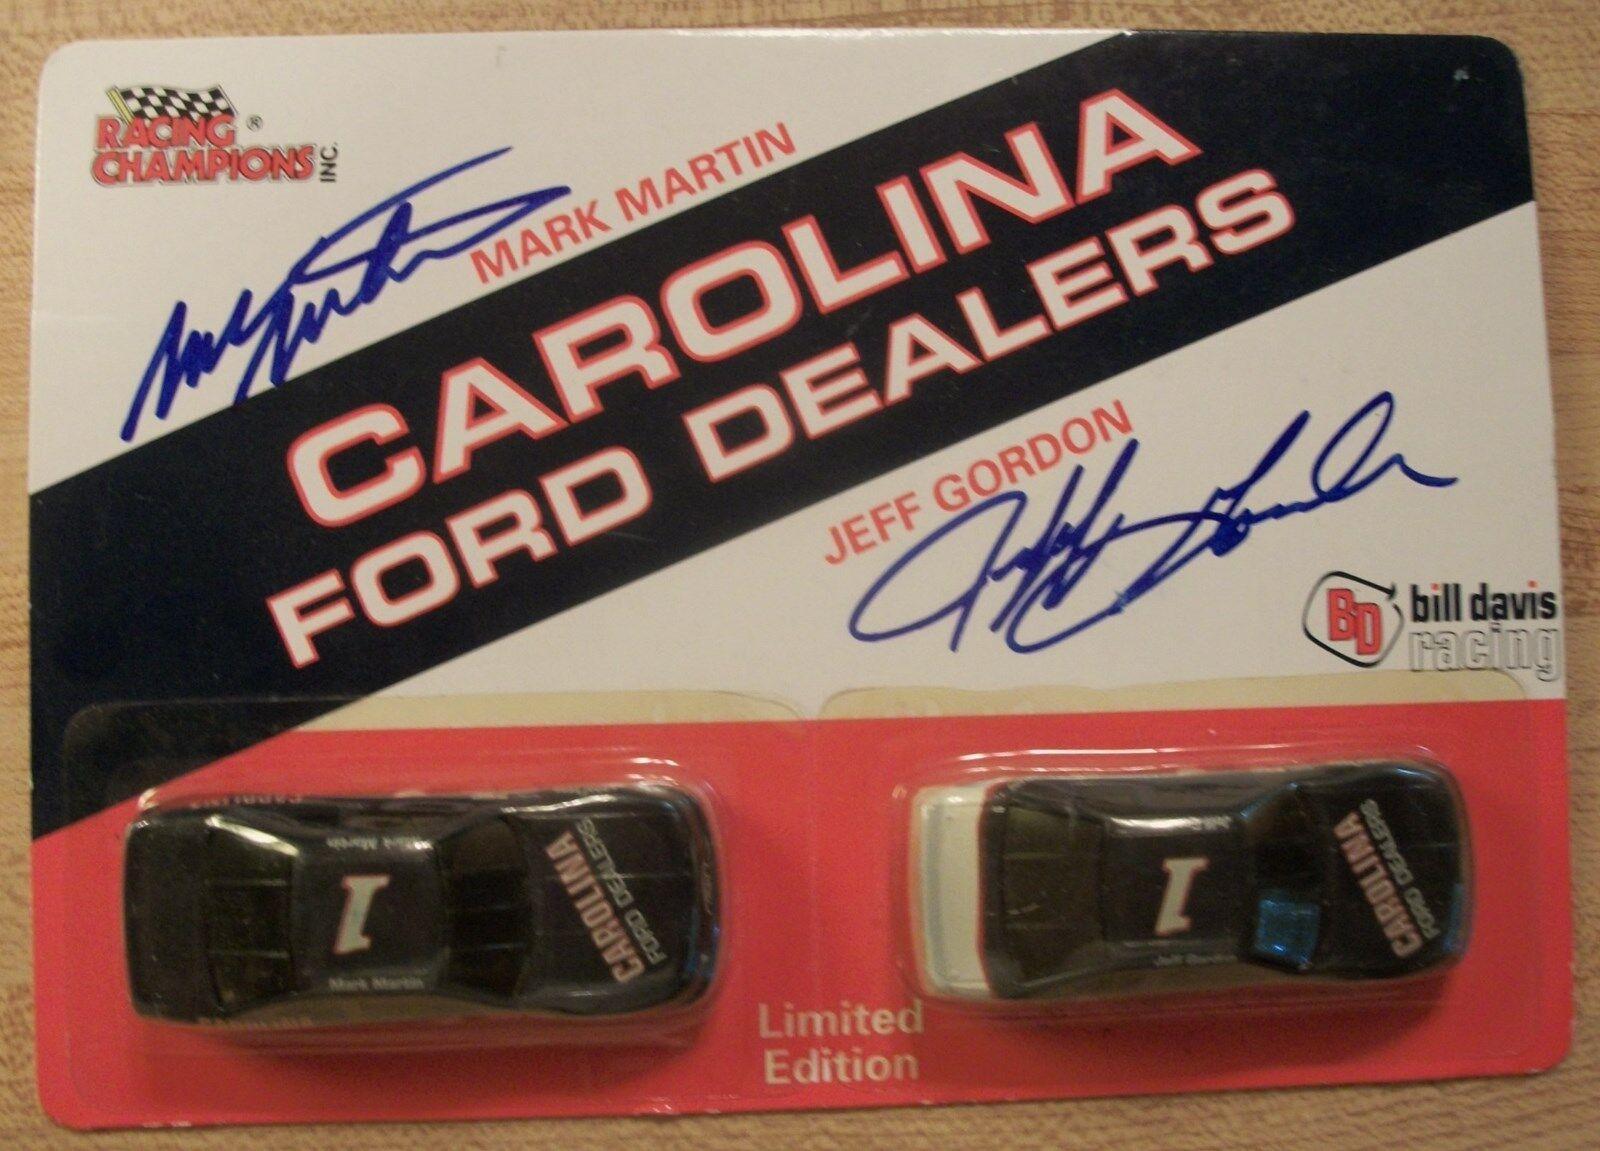 Jeff Gordon Mark Martin Carolina Ford distribuidores autógrafo Set Set Set mano sighned 1993 cea802